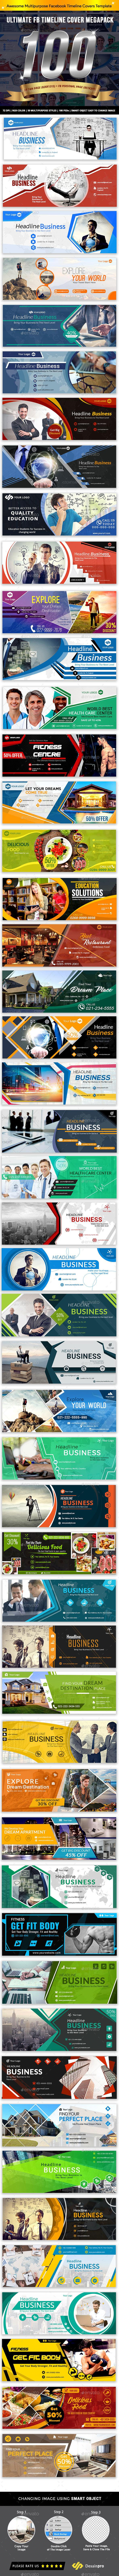 Facebook Cover Ultimate Megapack 100 PSD - AR - Facebook Timeline Covers Social Media